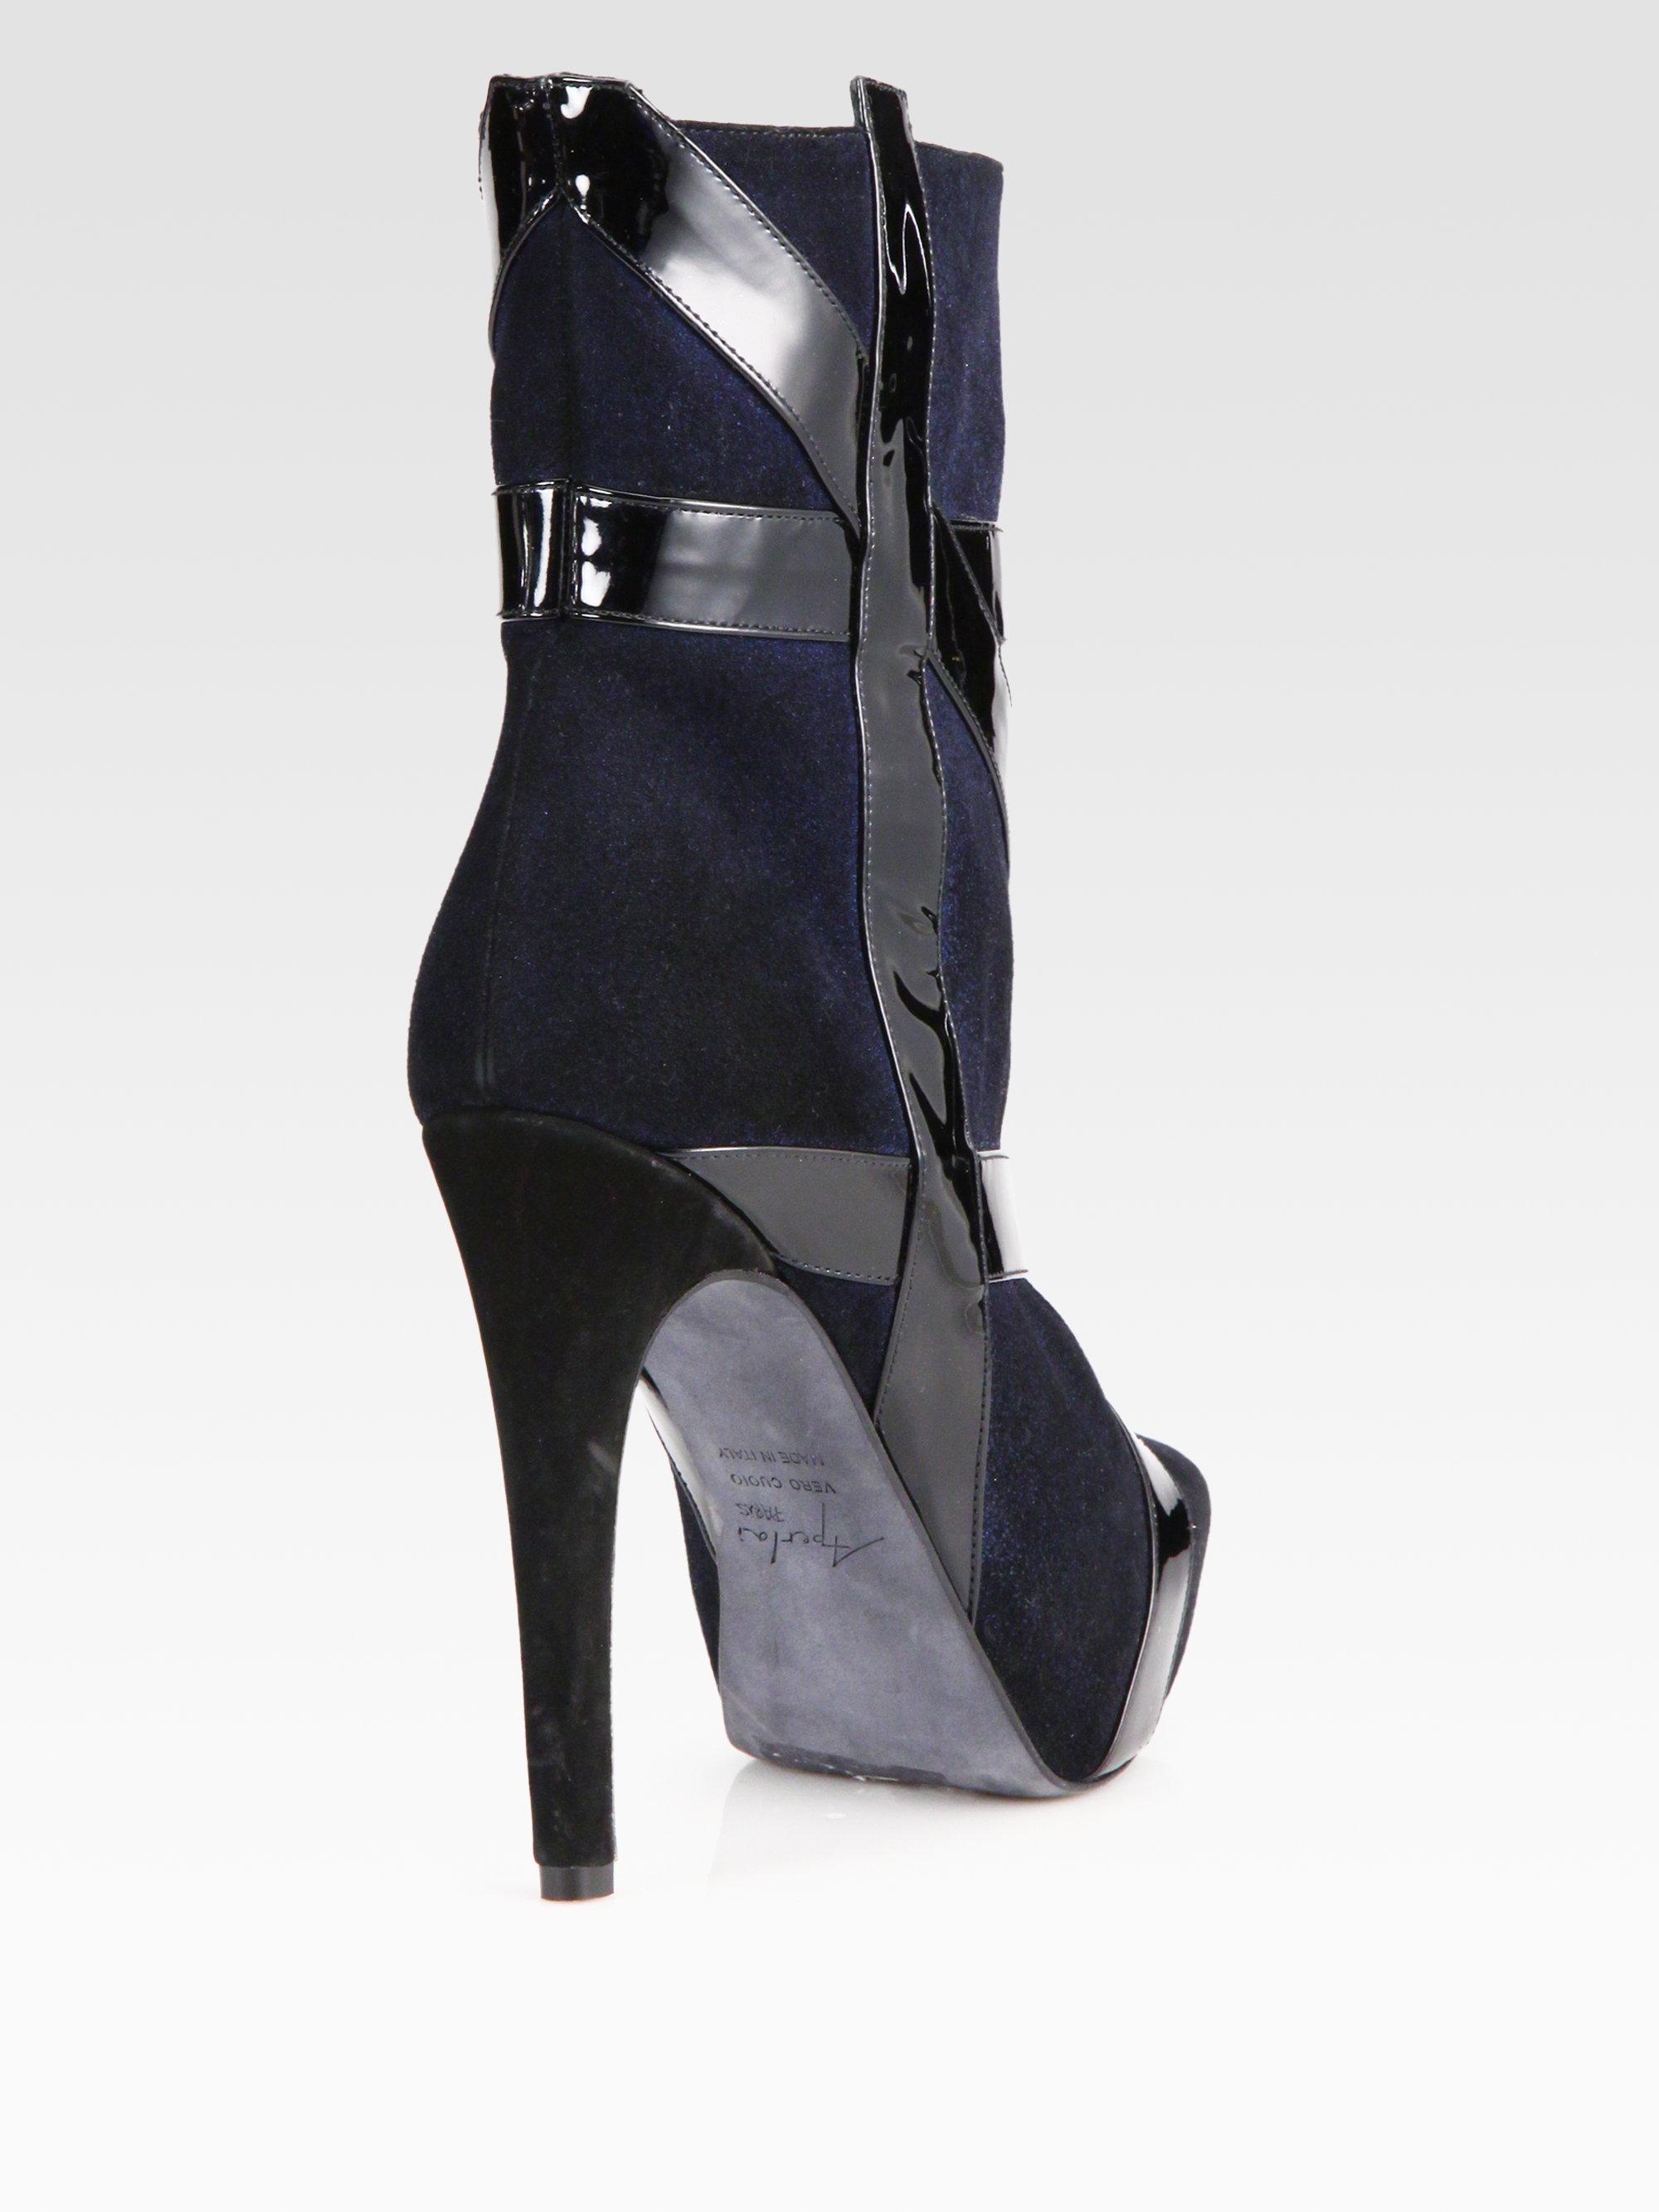 APERLAI Leather Ankle Boots 4U3tH